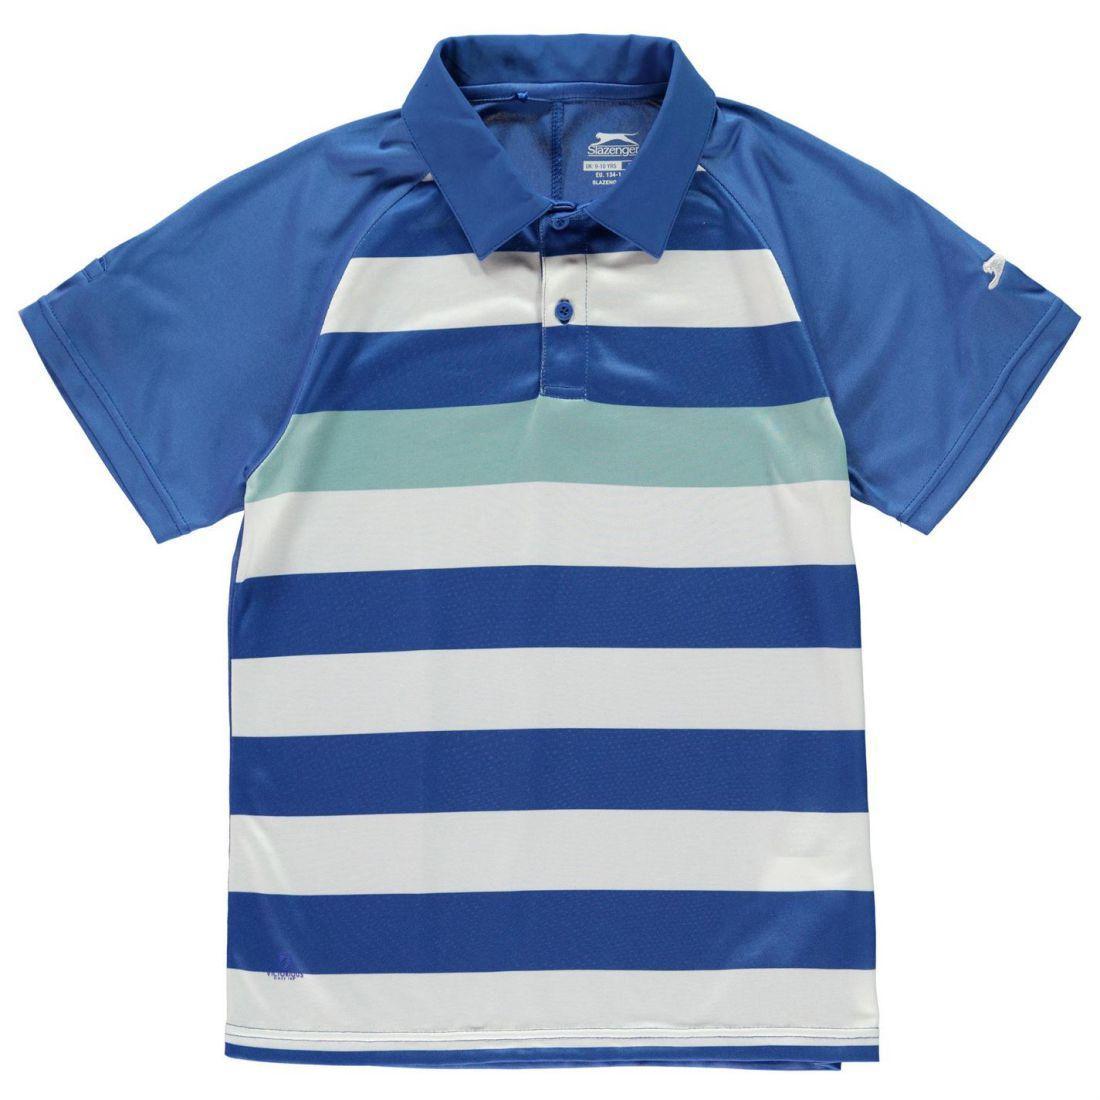 Slazenger Bold Stripe Polo Shirt Youngster Ragazzi Manica Corta Performance Tee Top